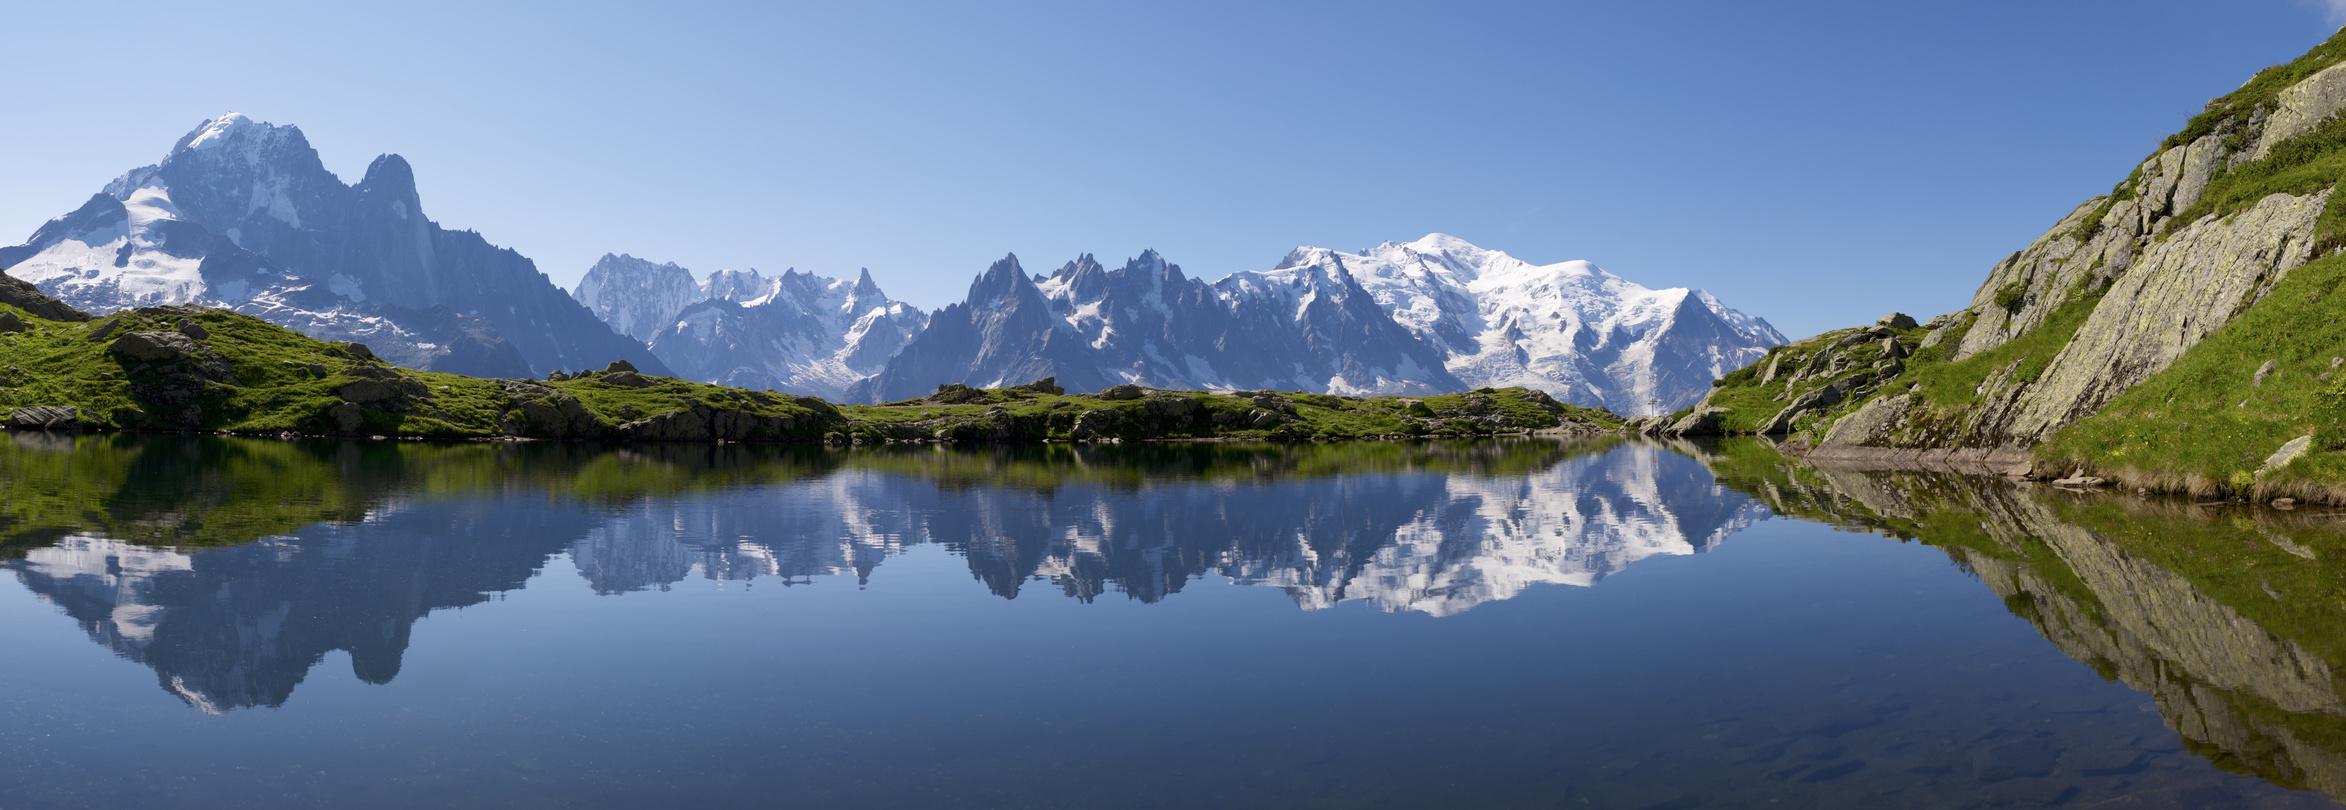 Tourisme en Savoie